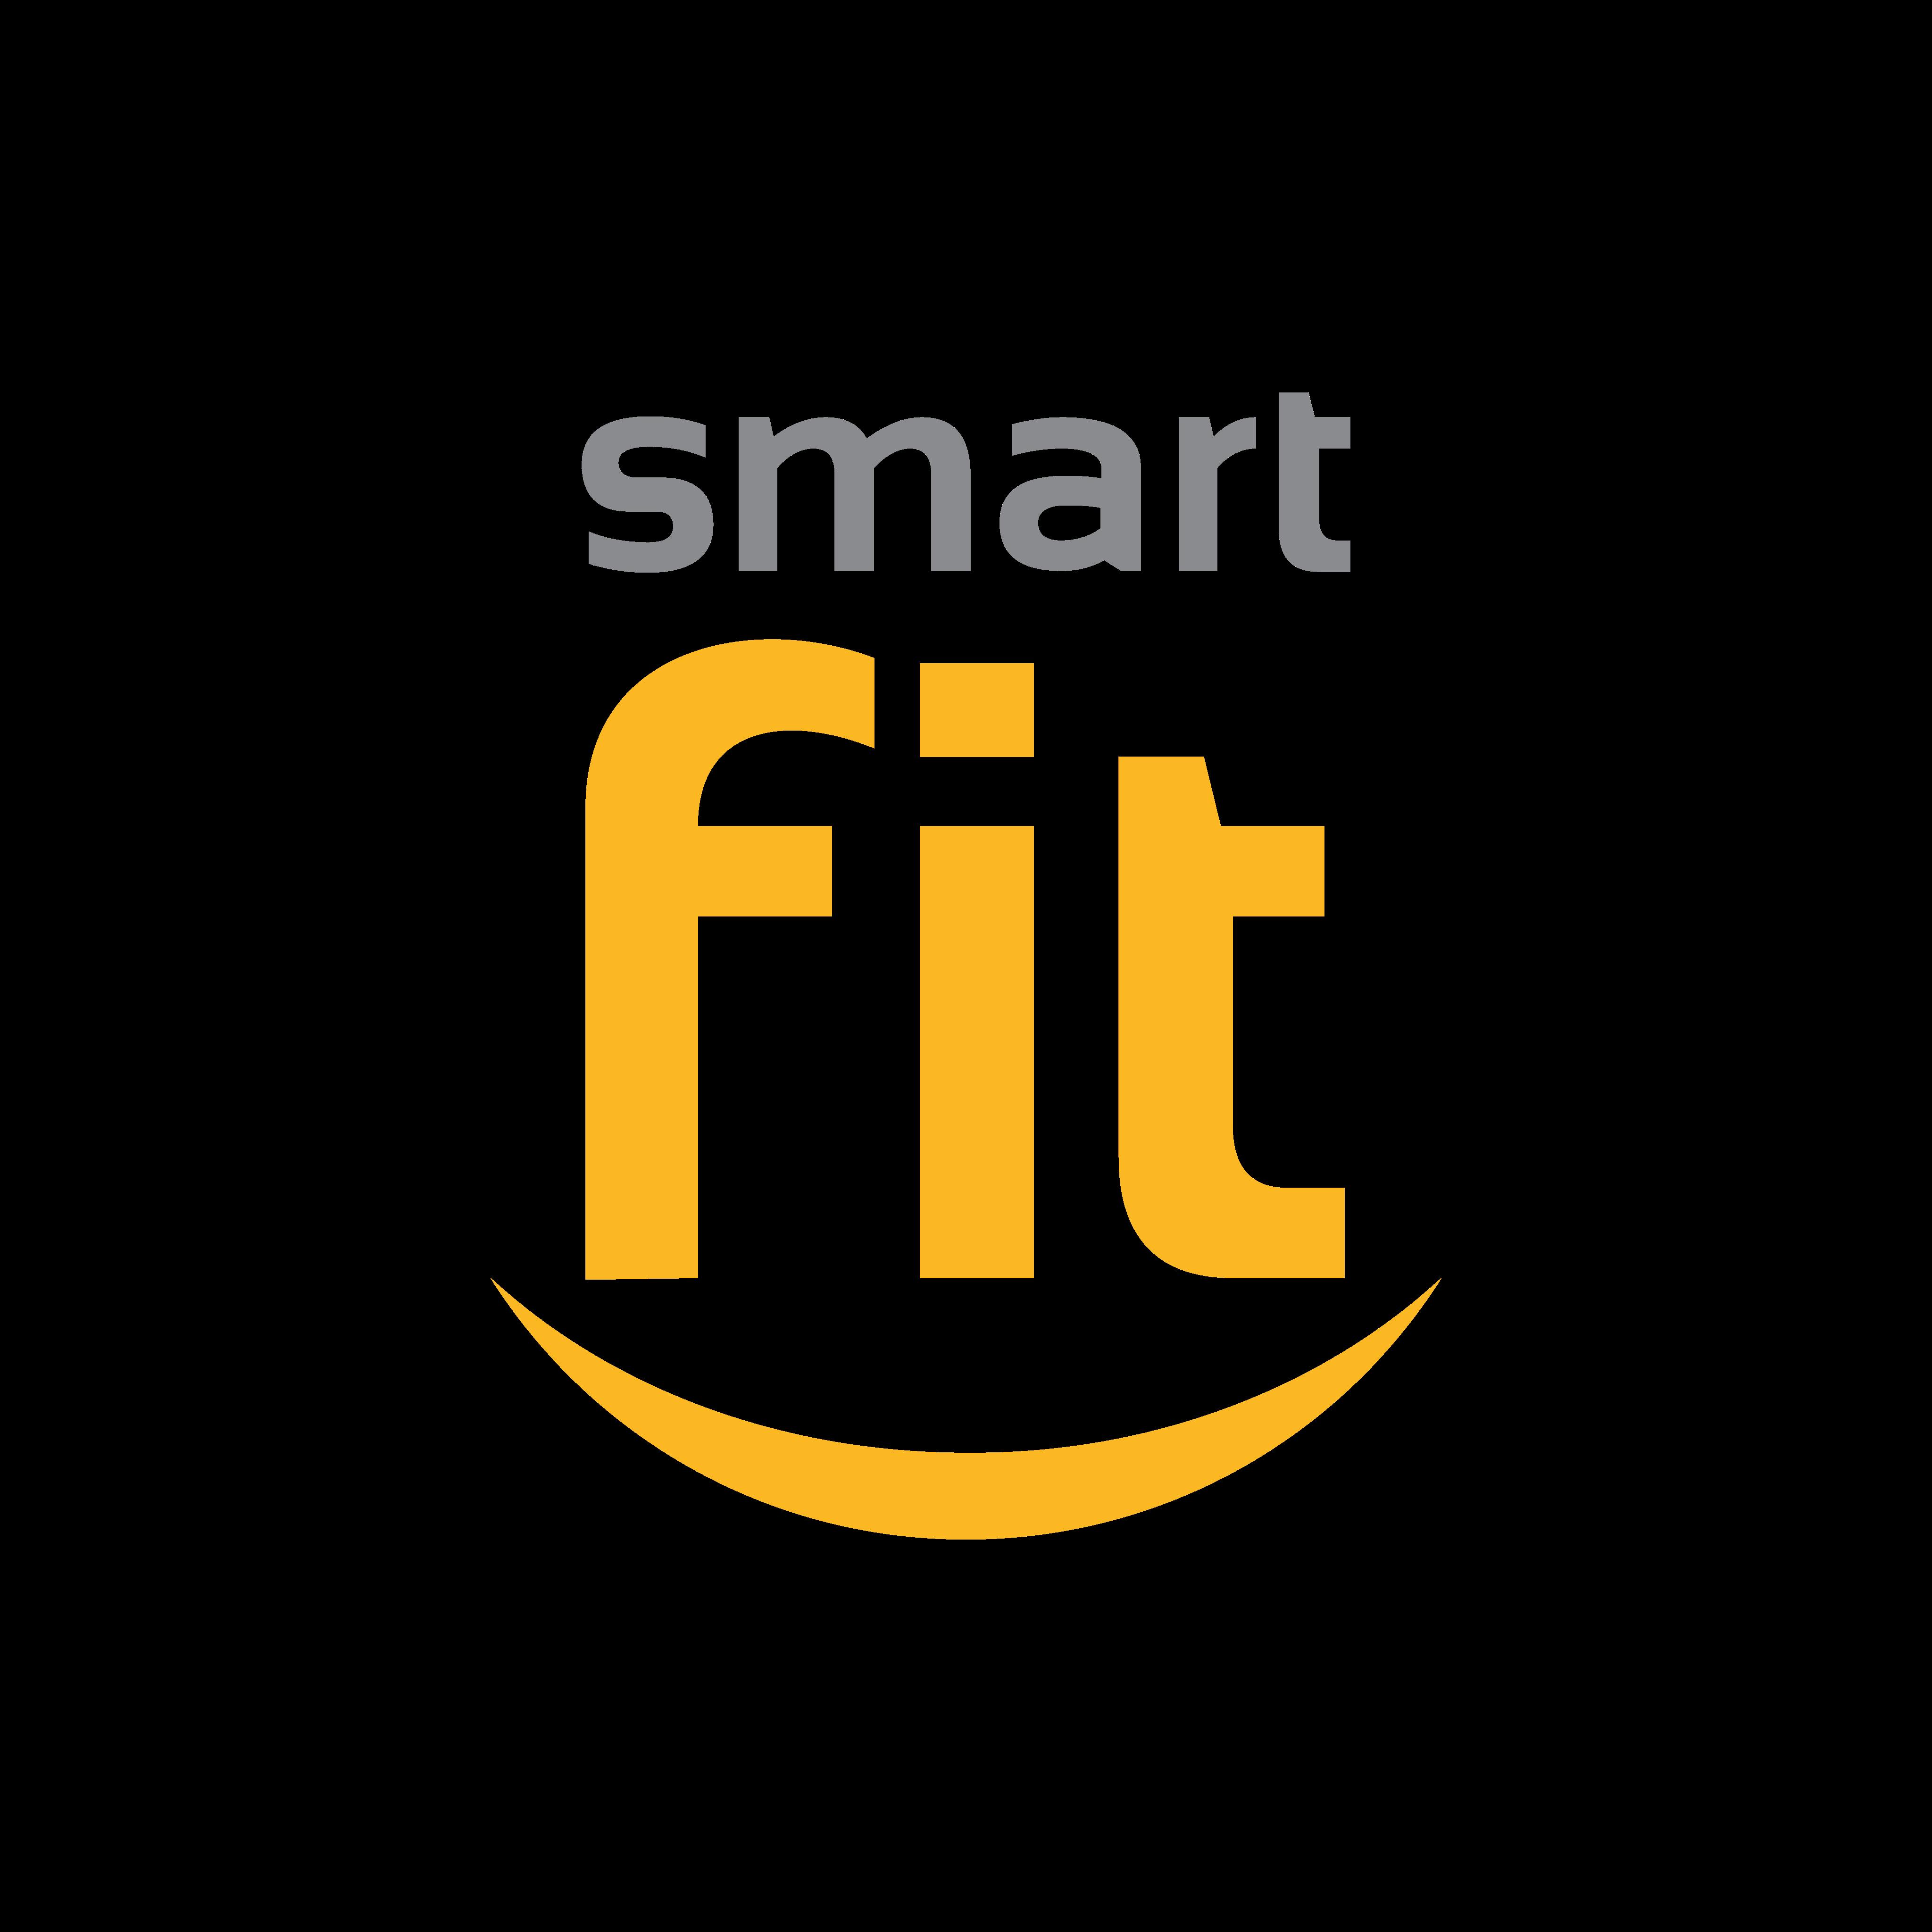 smart fit logo 0 - Smart Fit Logo